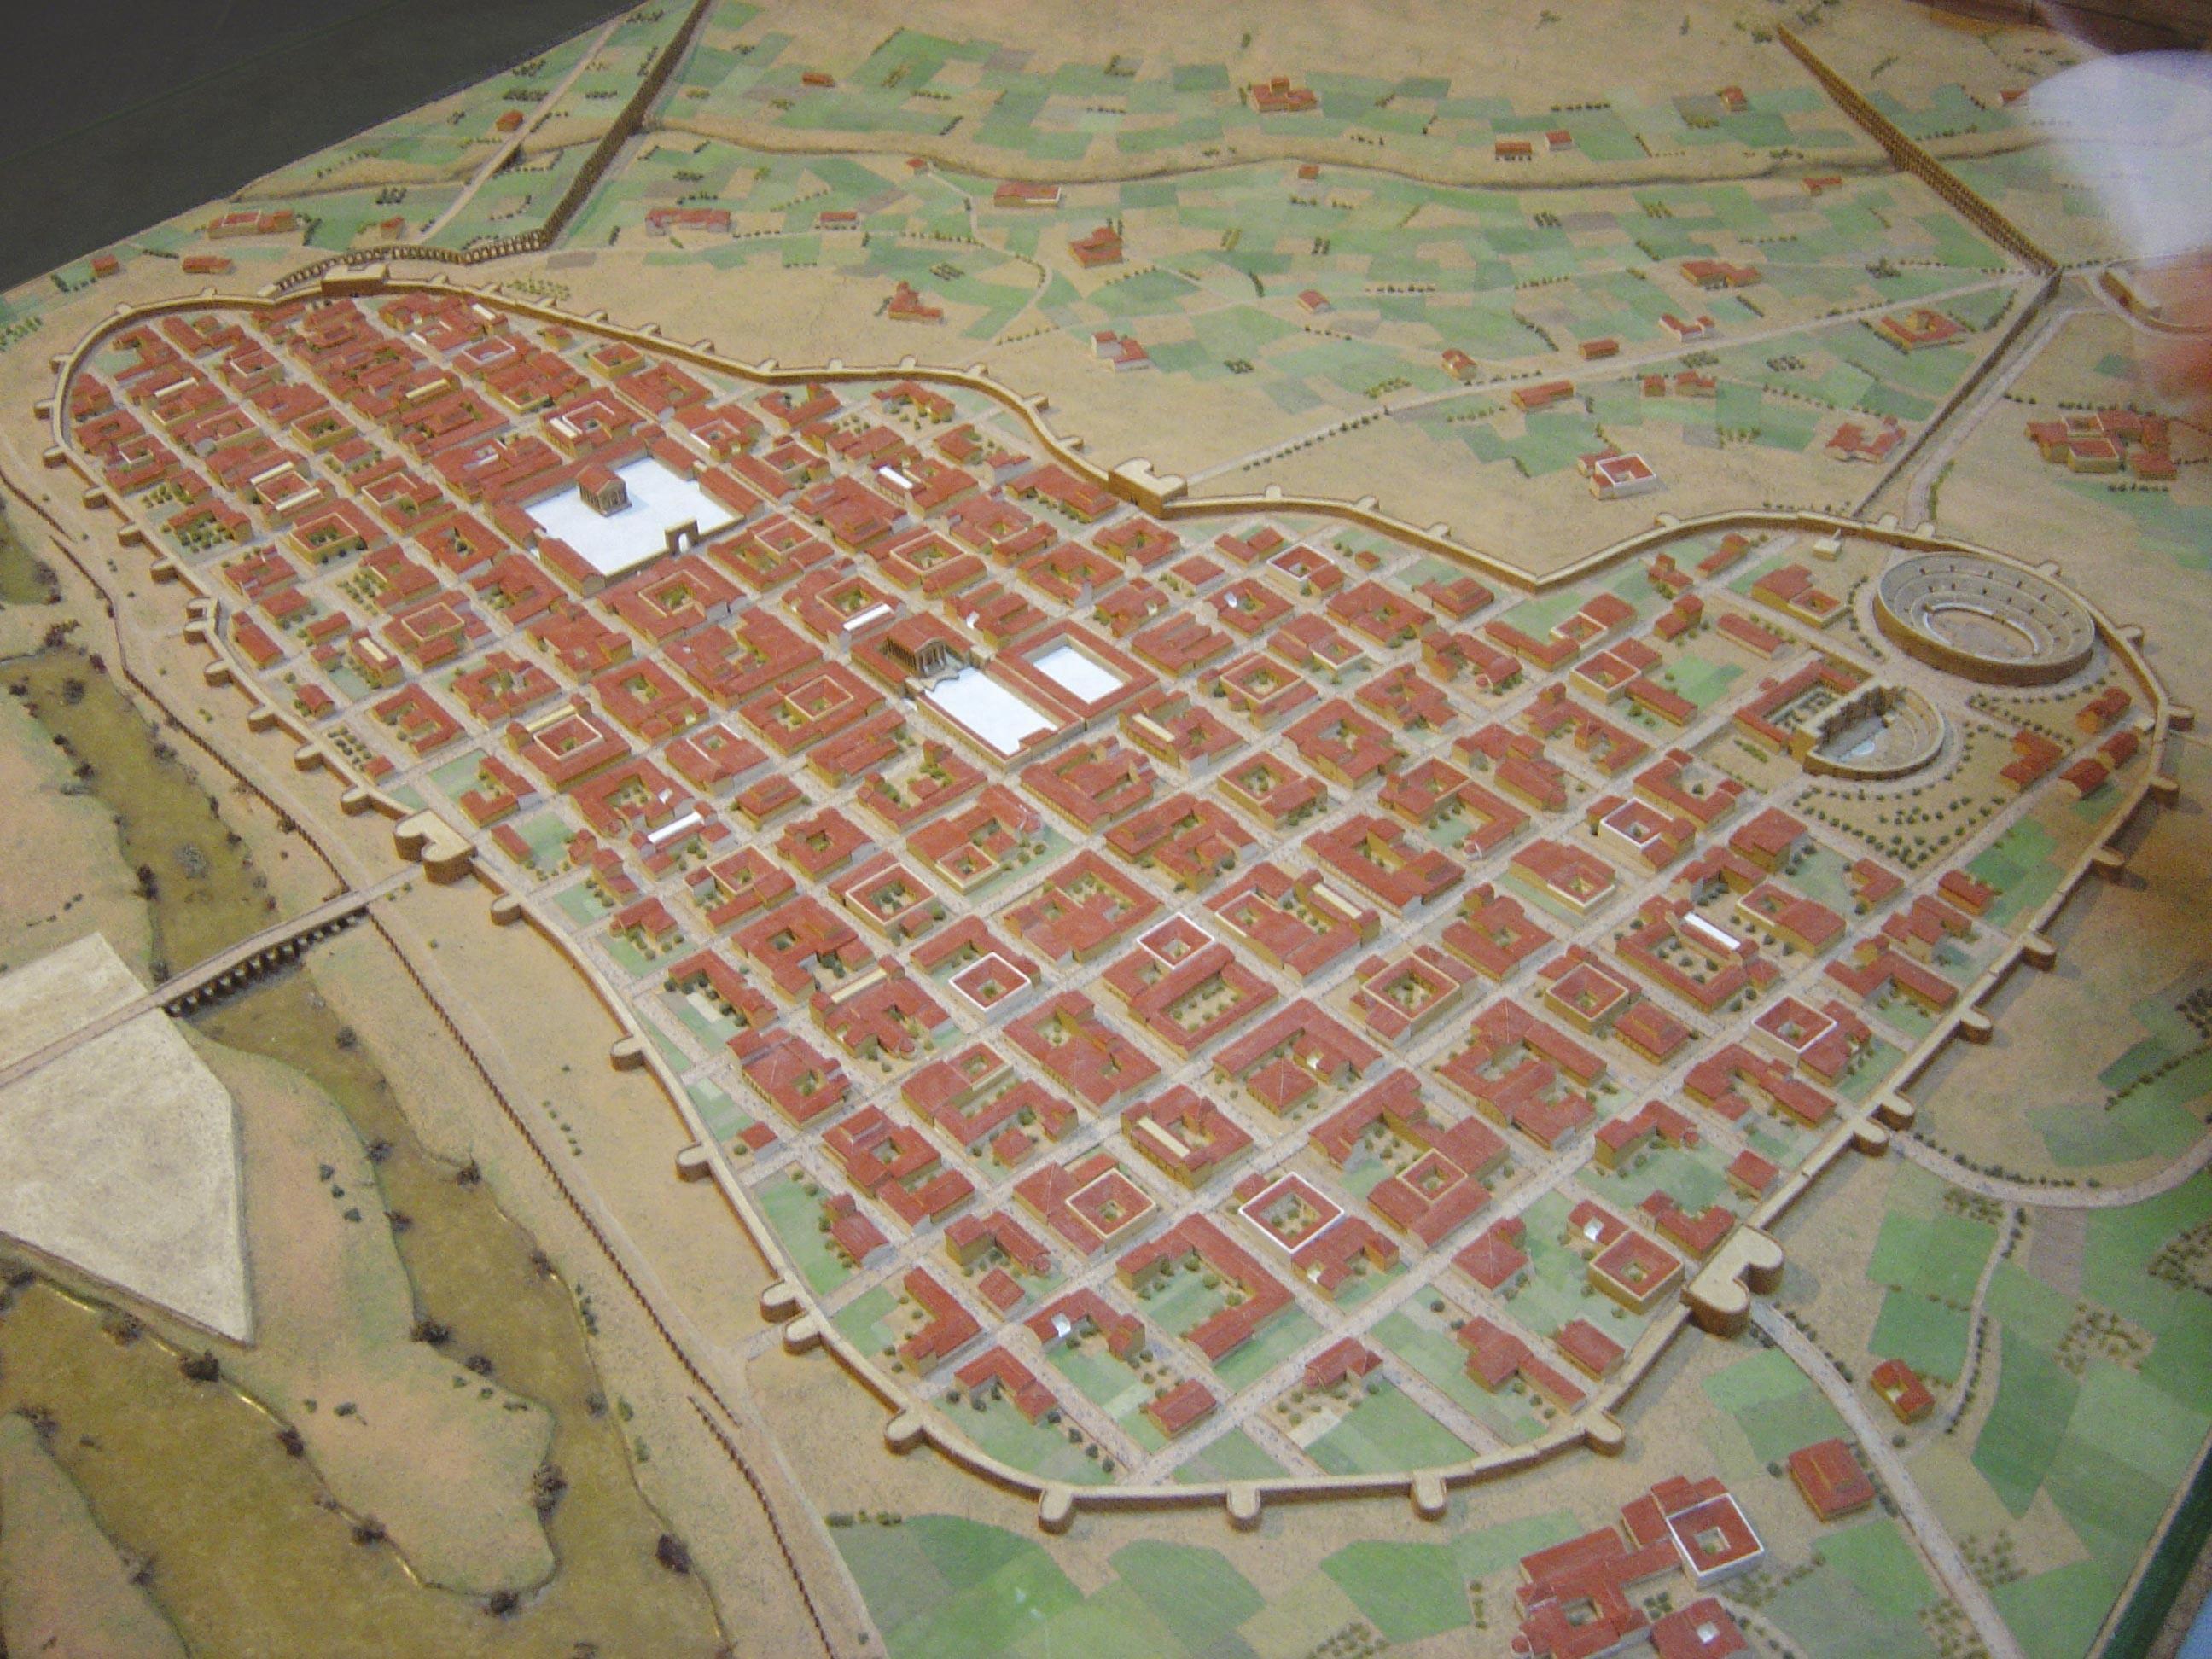 <stamp theme='his-green2'>Doc. 2</stamp> Reconstitution de la ville romaine d'Emerita Augusta sous l'Empire